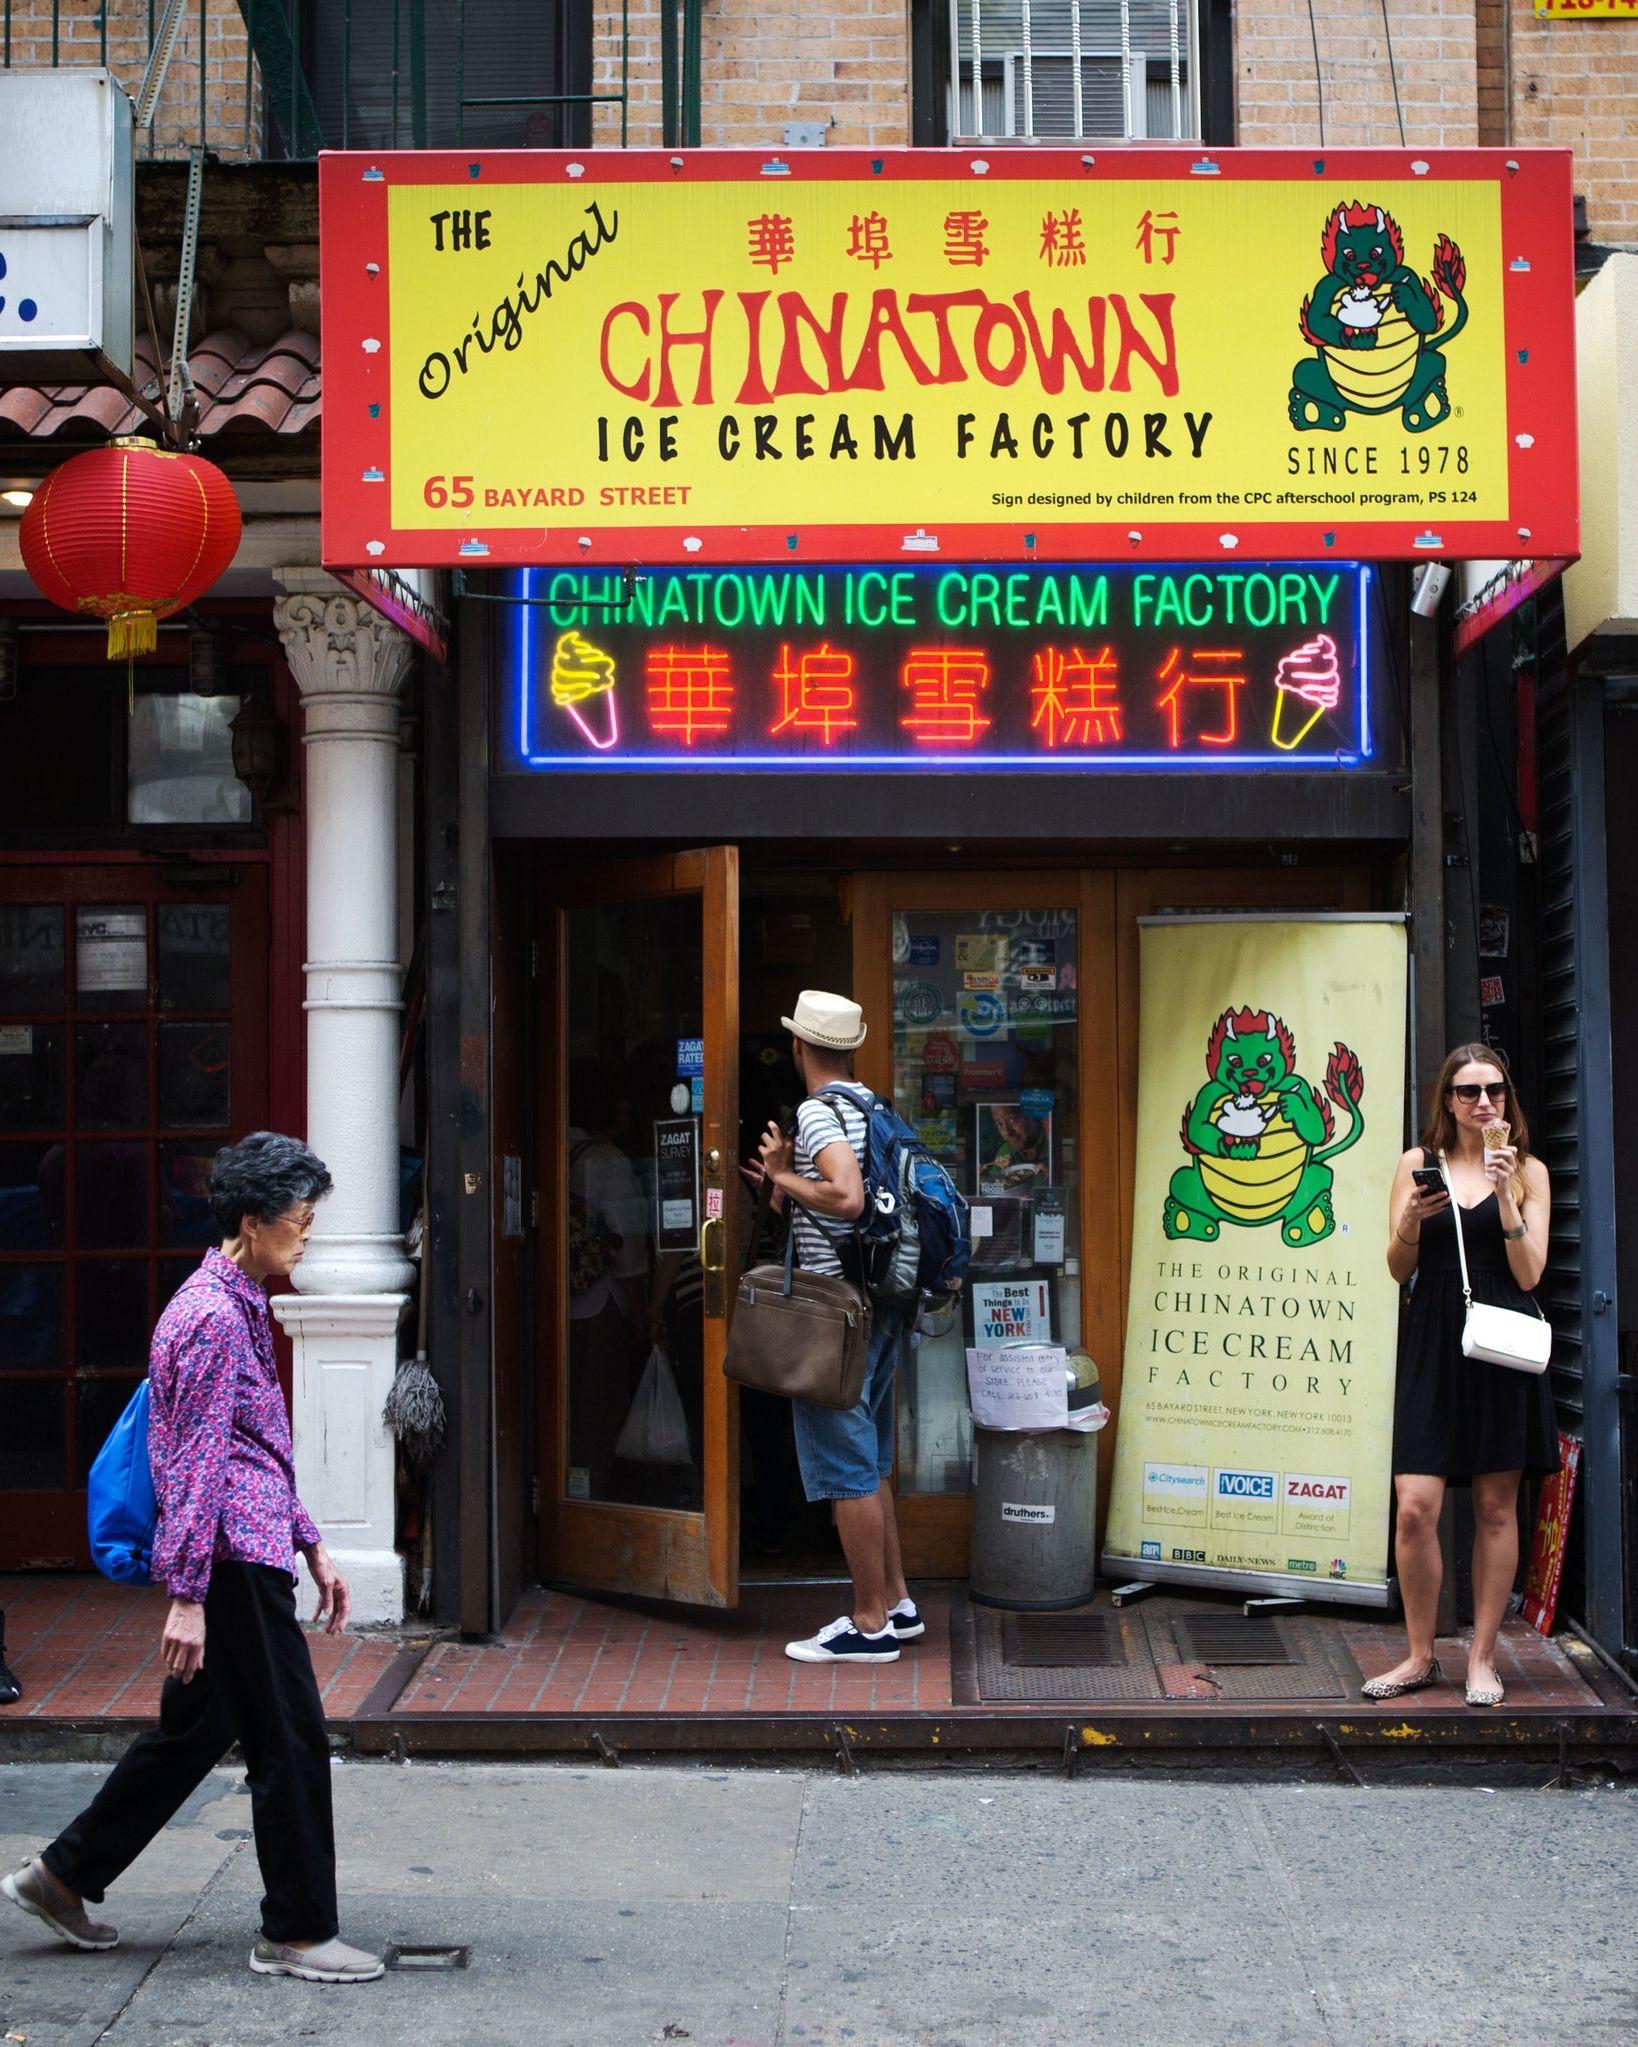 Chinatown Ice Cream Factory Where A Scoop Of Durian Is Plain Vanilla Ice Cream Factory New York Chinatown Chinatown